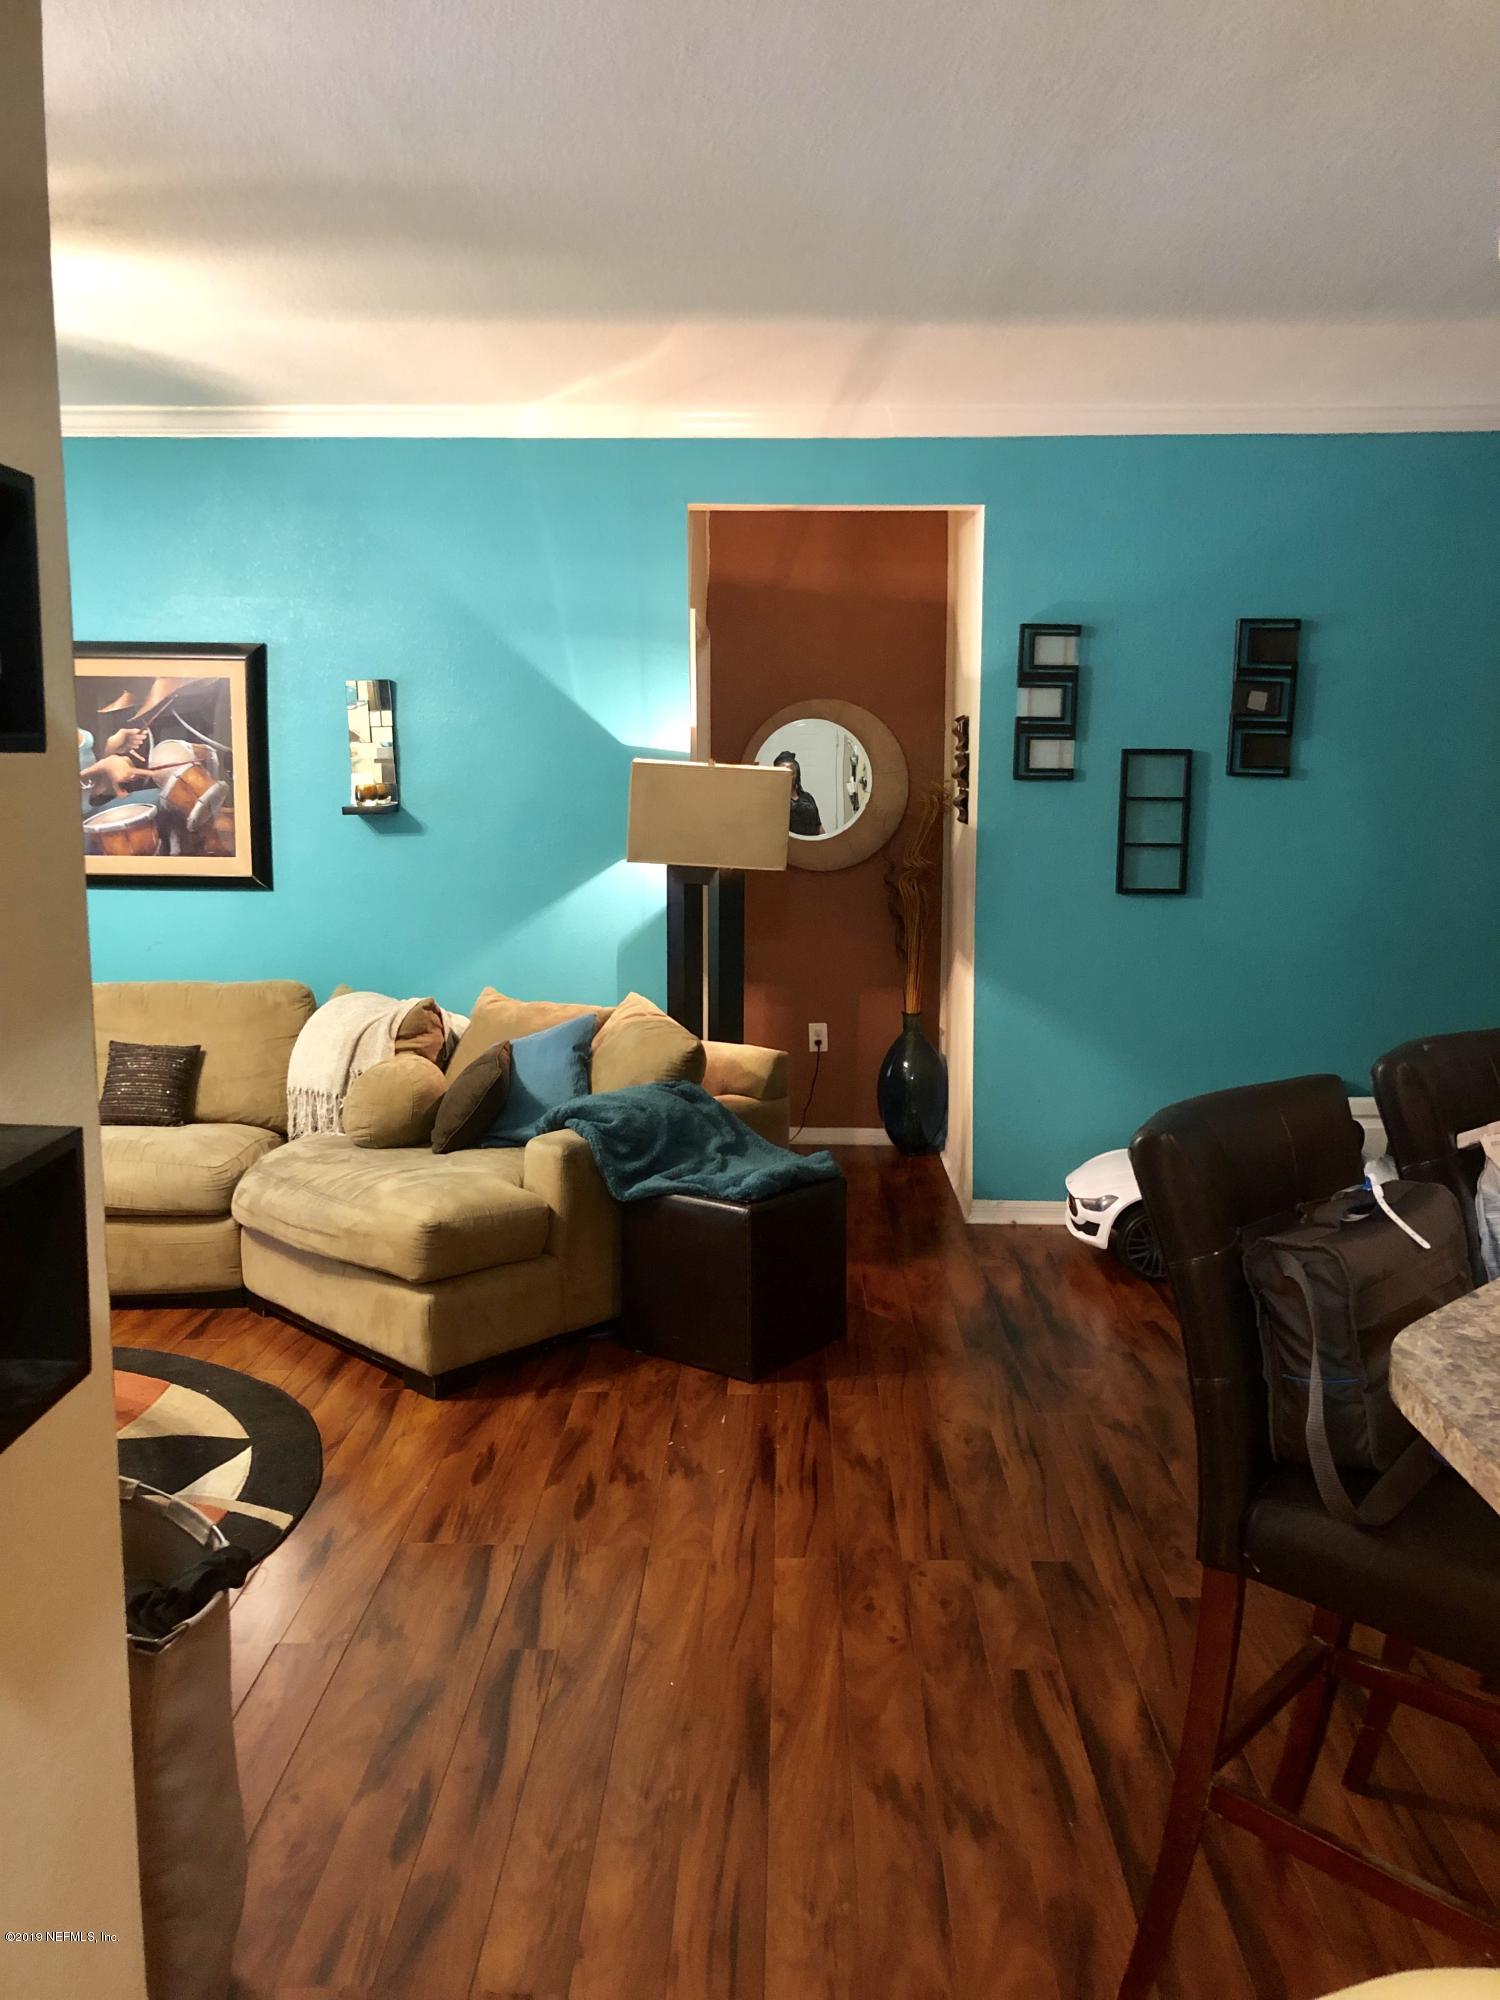 10961 BURNT MILL- JACKSONVILLE- FLORIDA 32256, 2 Bedrooms Bedrooms, ,2 BathroomsBathrooms,Condo,For sale,BURNT MILL,994422